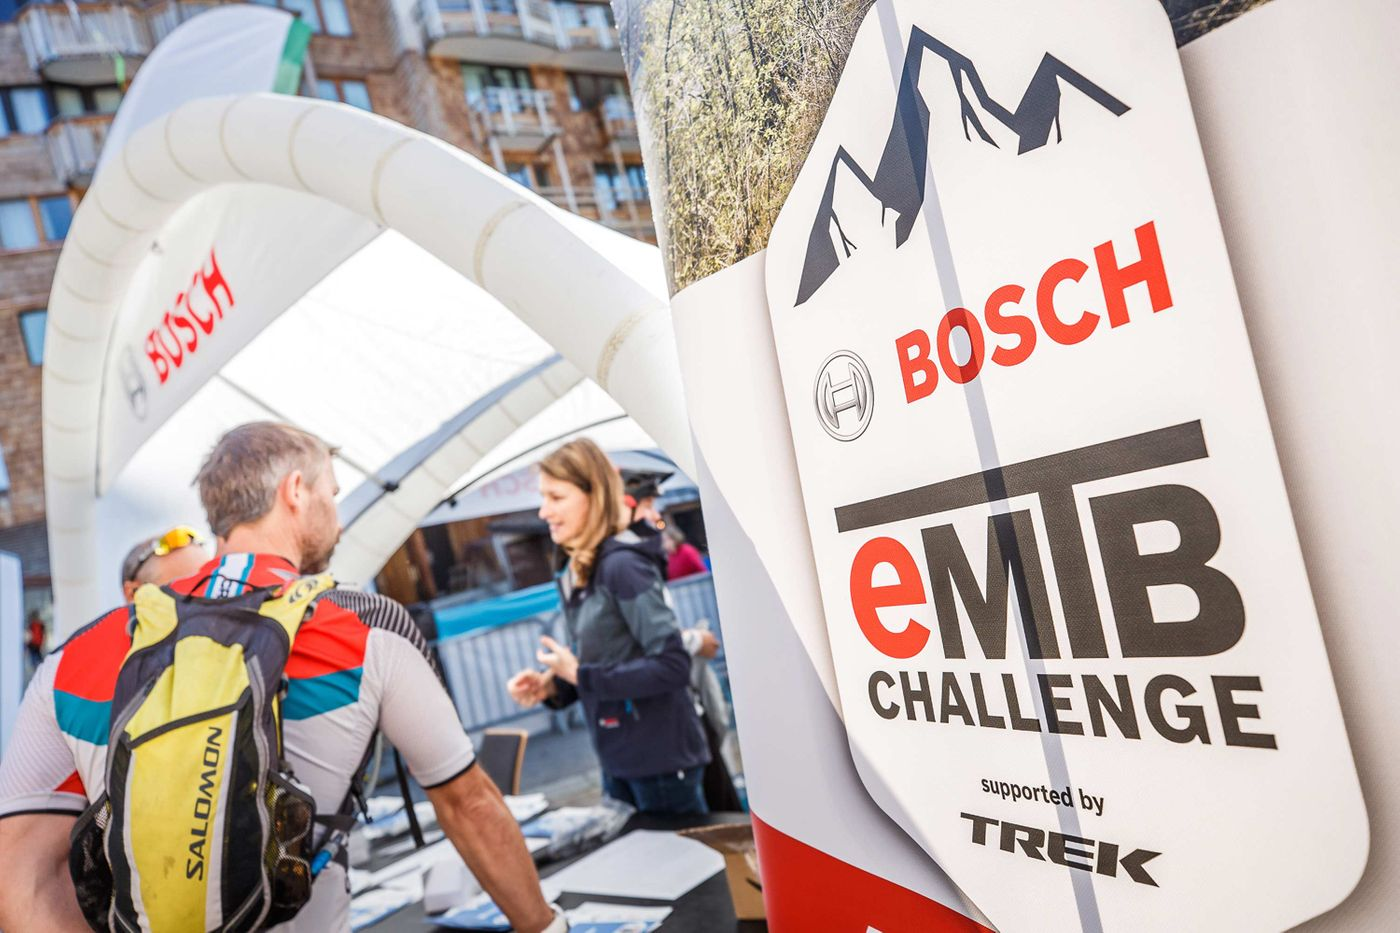 Verbier_E-Bike_Festival_Bosch_eMTB_challenge